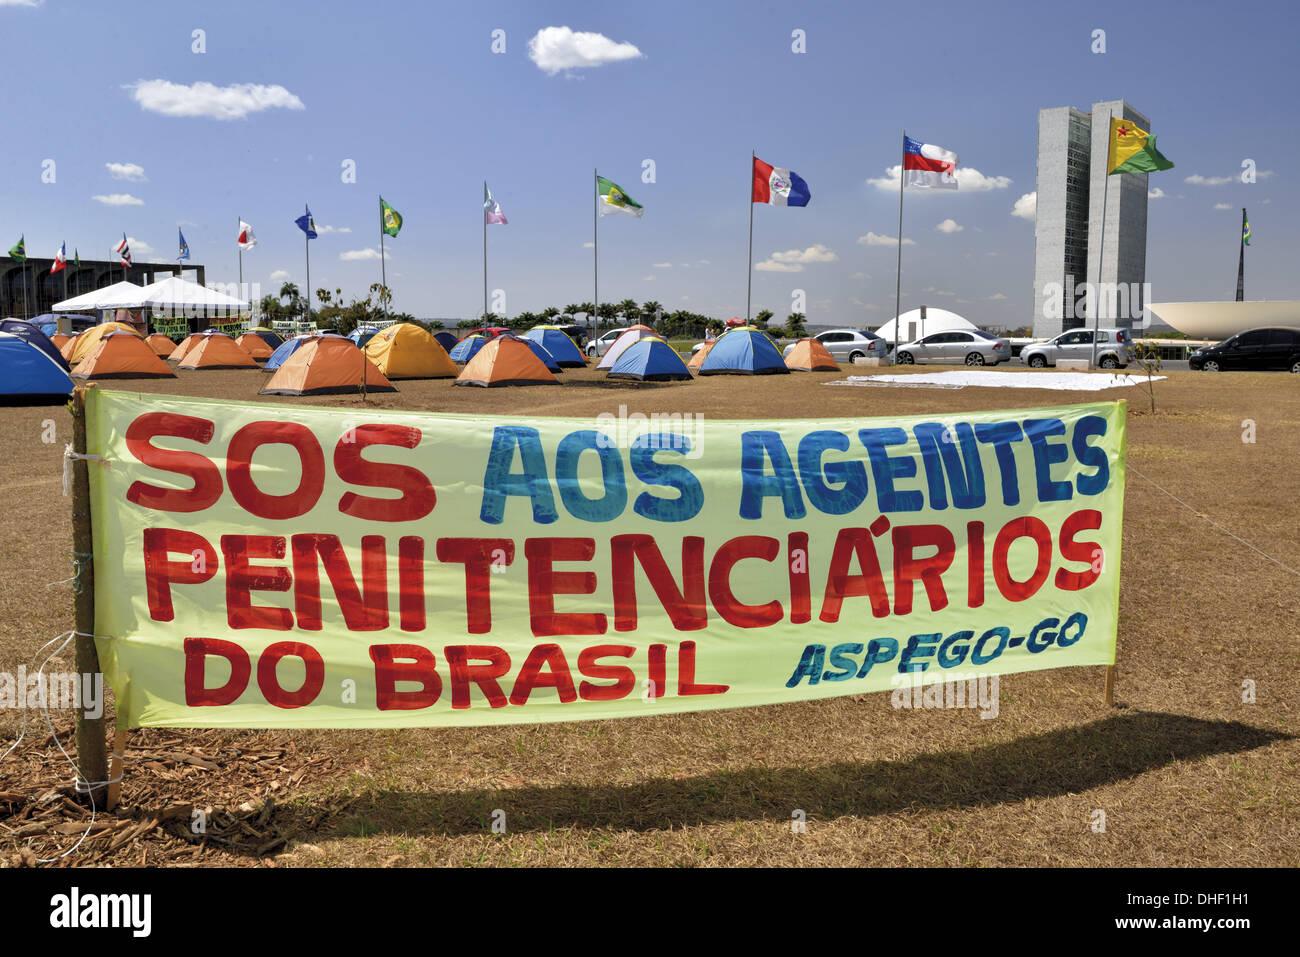 Brazil, Brasilia, manifestation, demonstration, political manifestation, Acampamento Uniao, society, protests, people Stock Photo